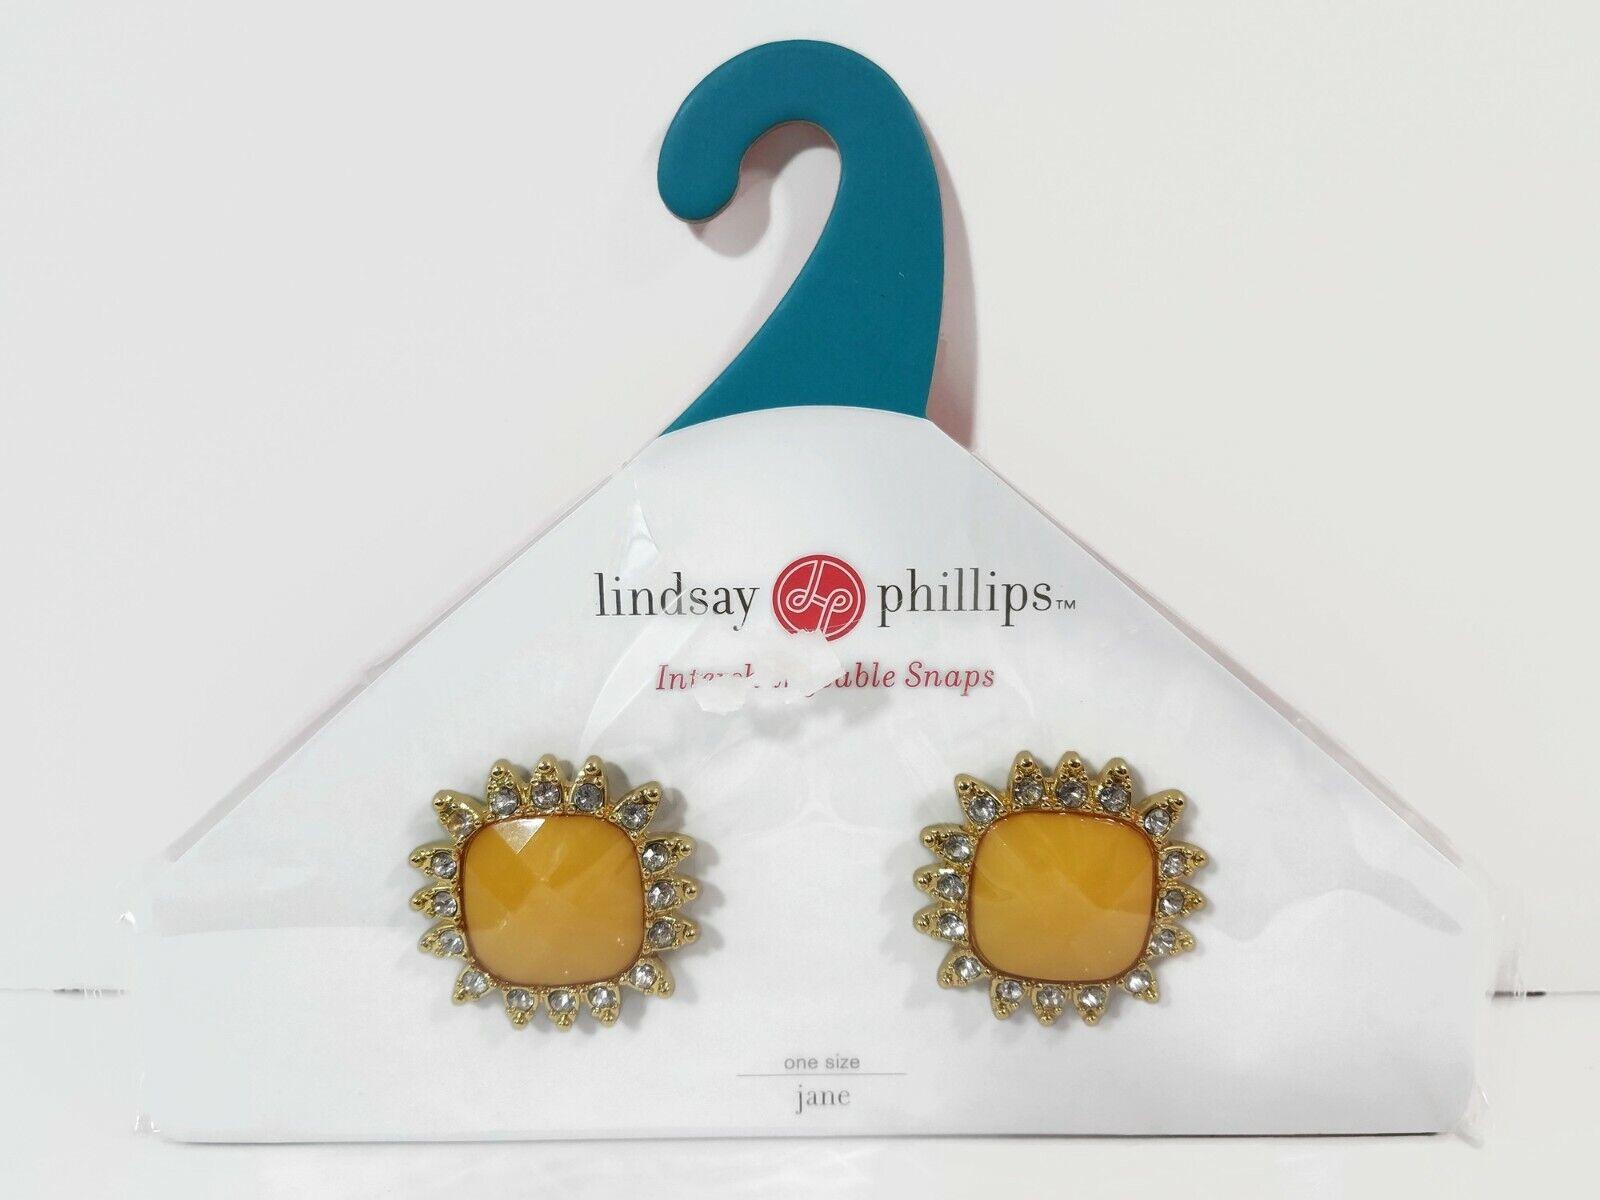 Lindsay Phillips Snaps Shoe Jewelry JANE Switchflops